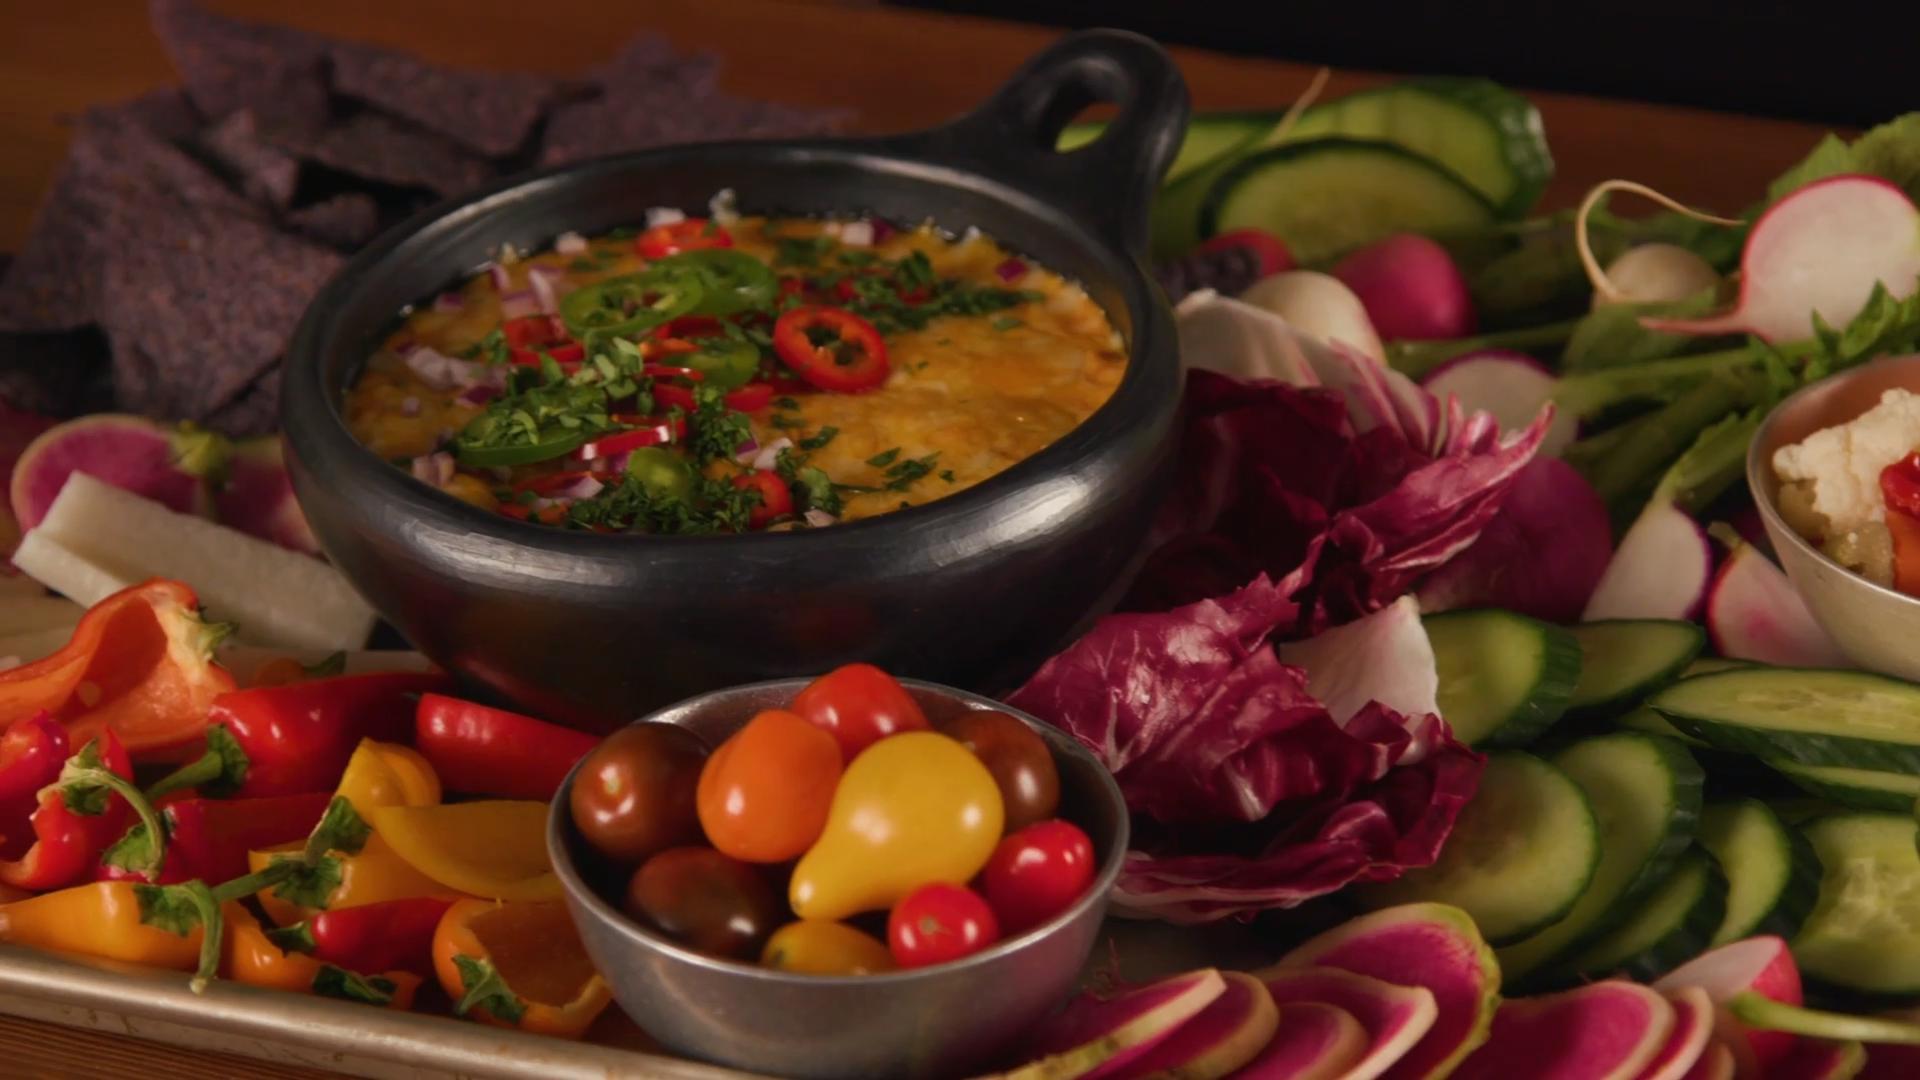 This Queso Snack Dinner Recipe Has a Surprising Secret Ingredient